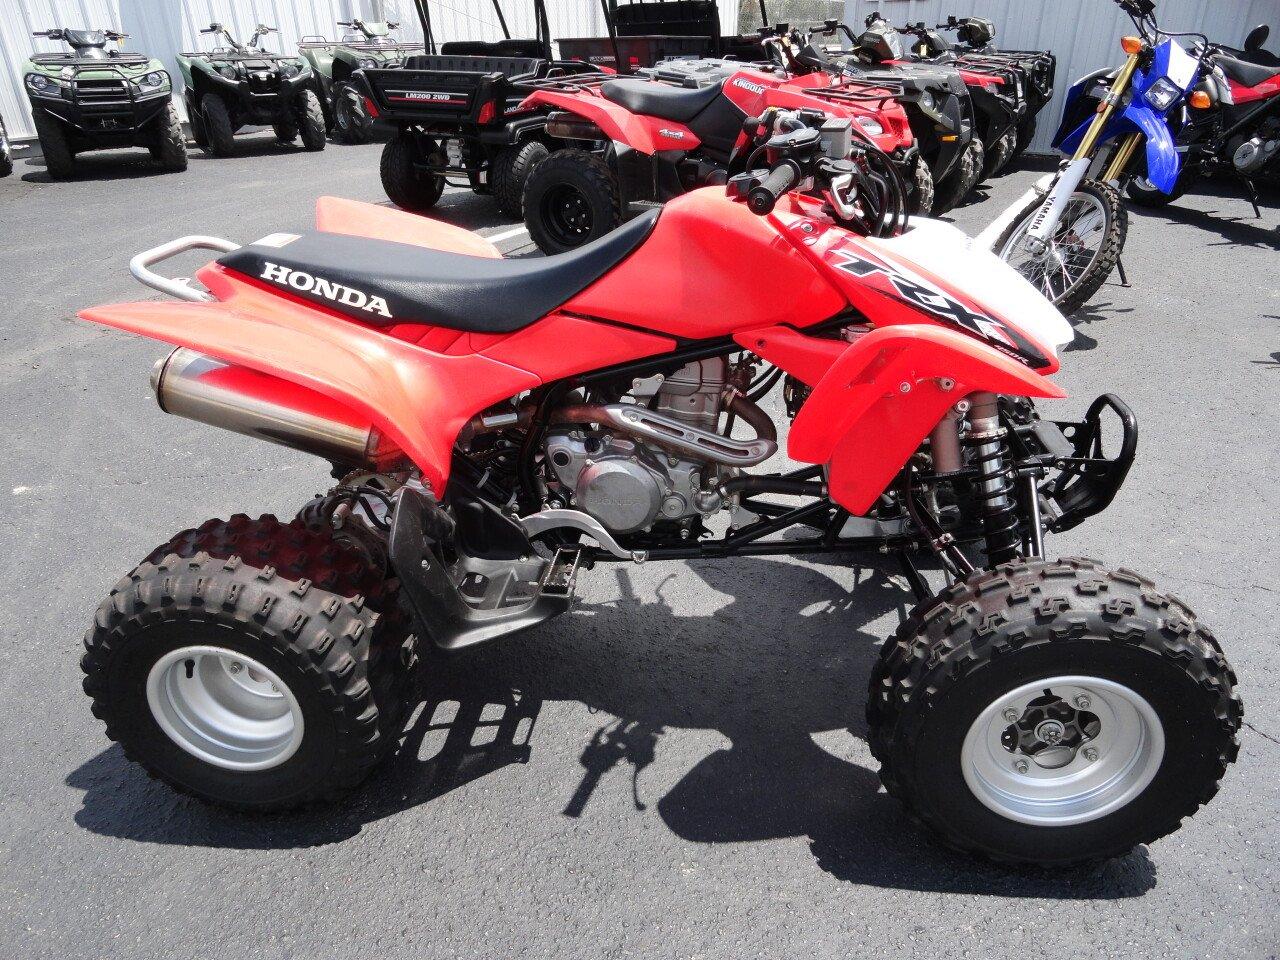 2014 honda trx450r for sale near longwood florida 32750